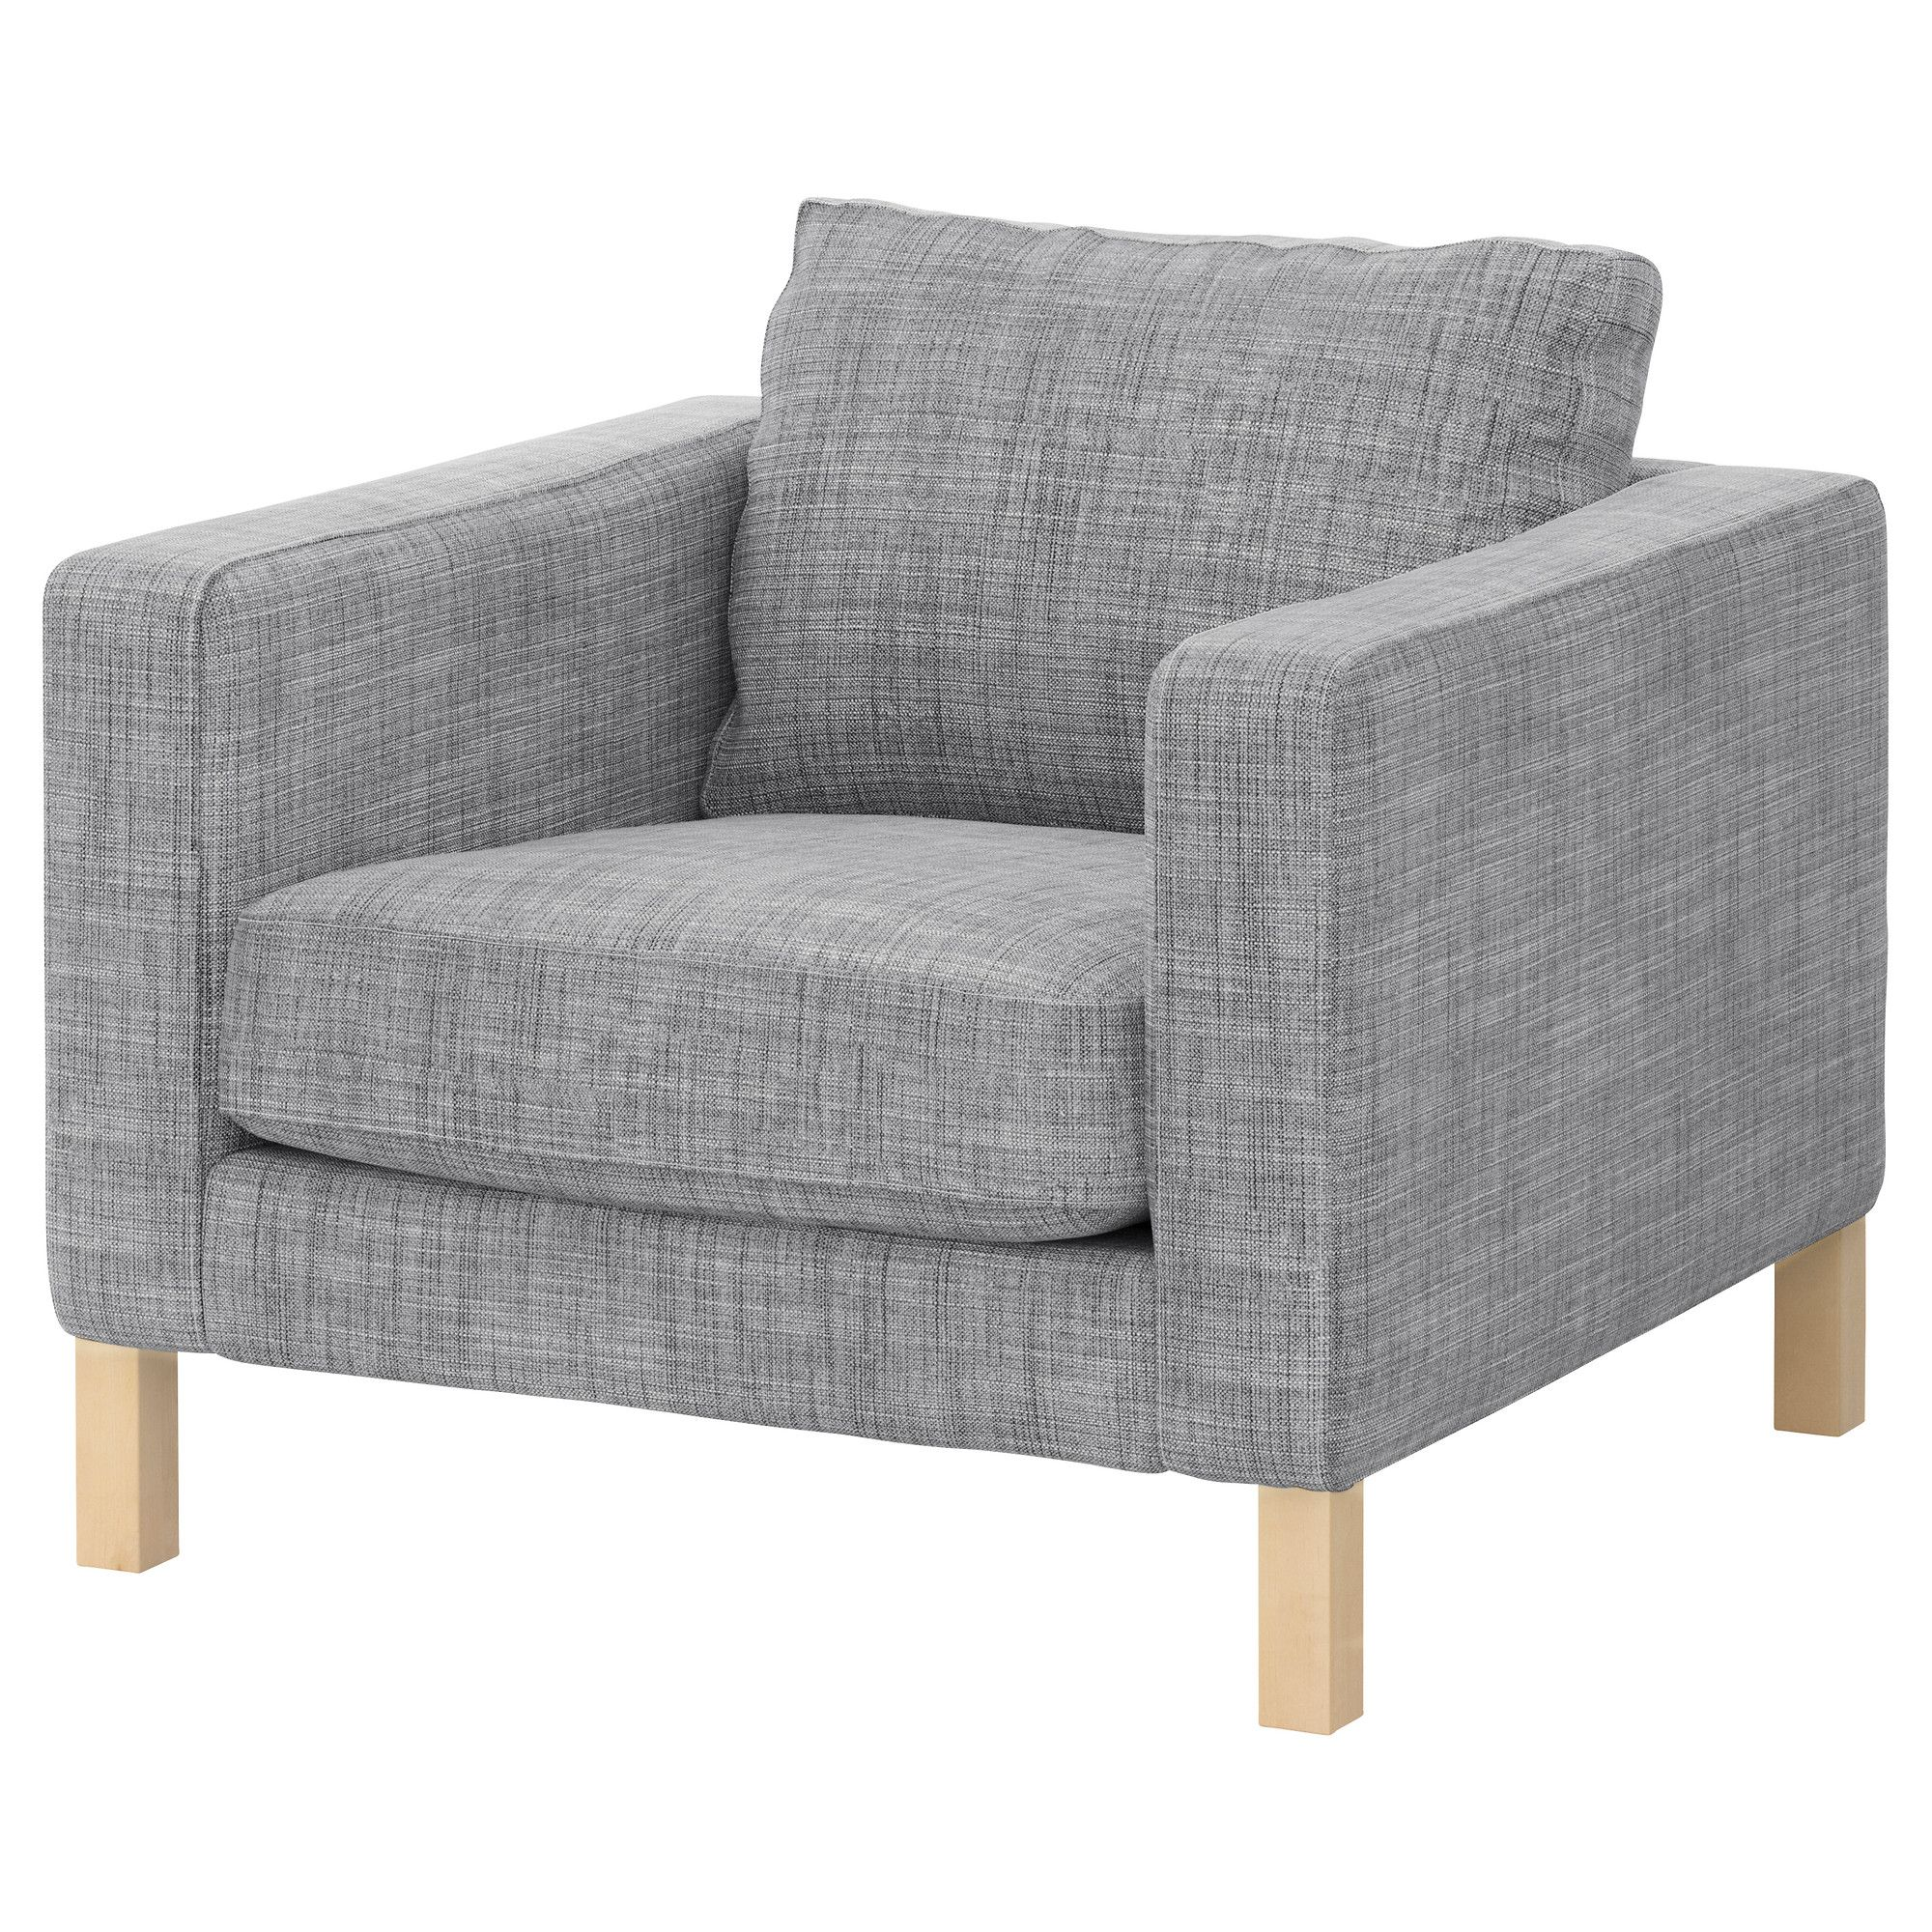 KARLSTAD Chair - Isunda gray - IKEA | Home | Pinterest ...